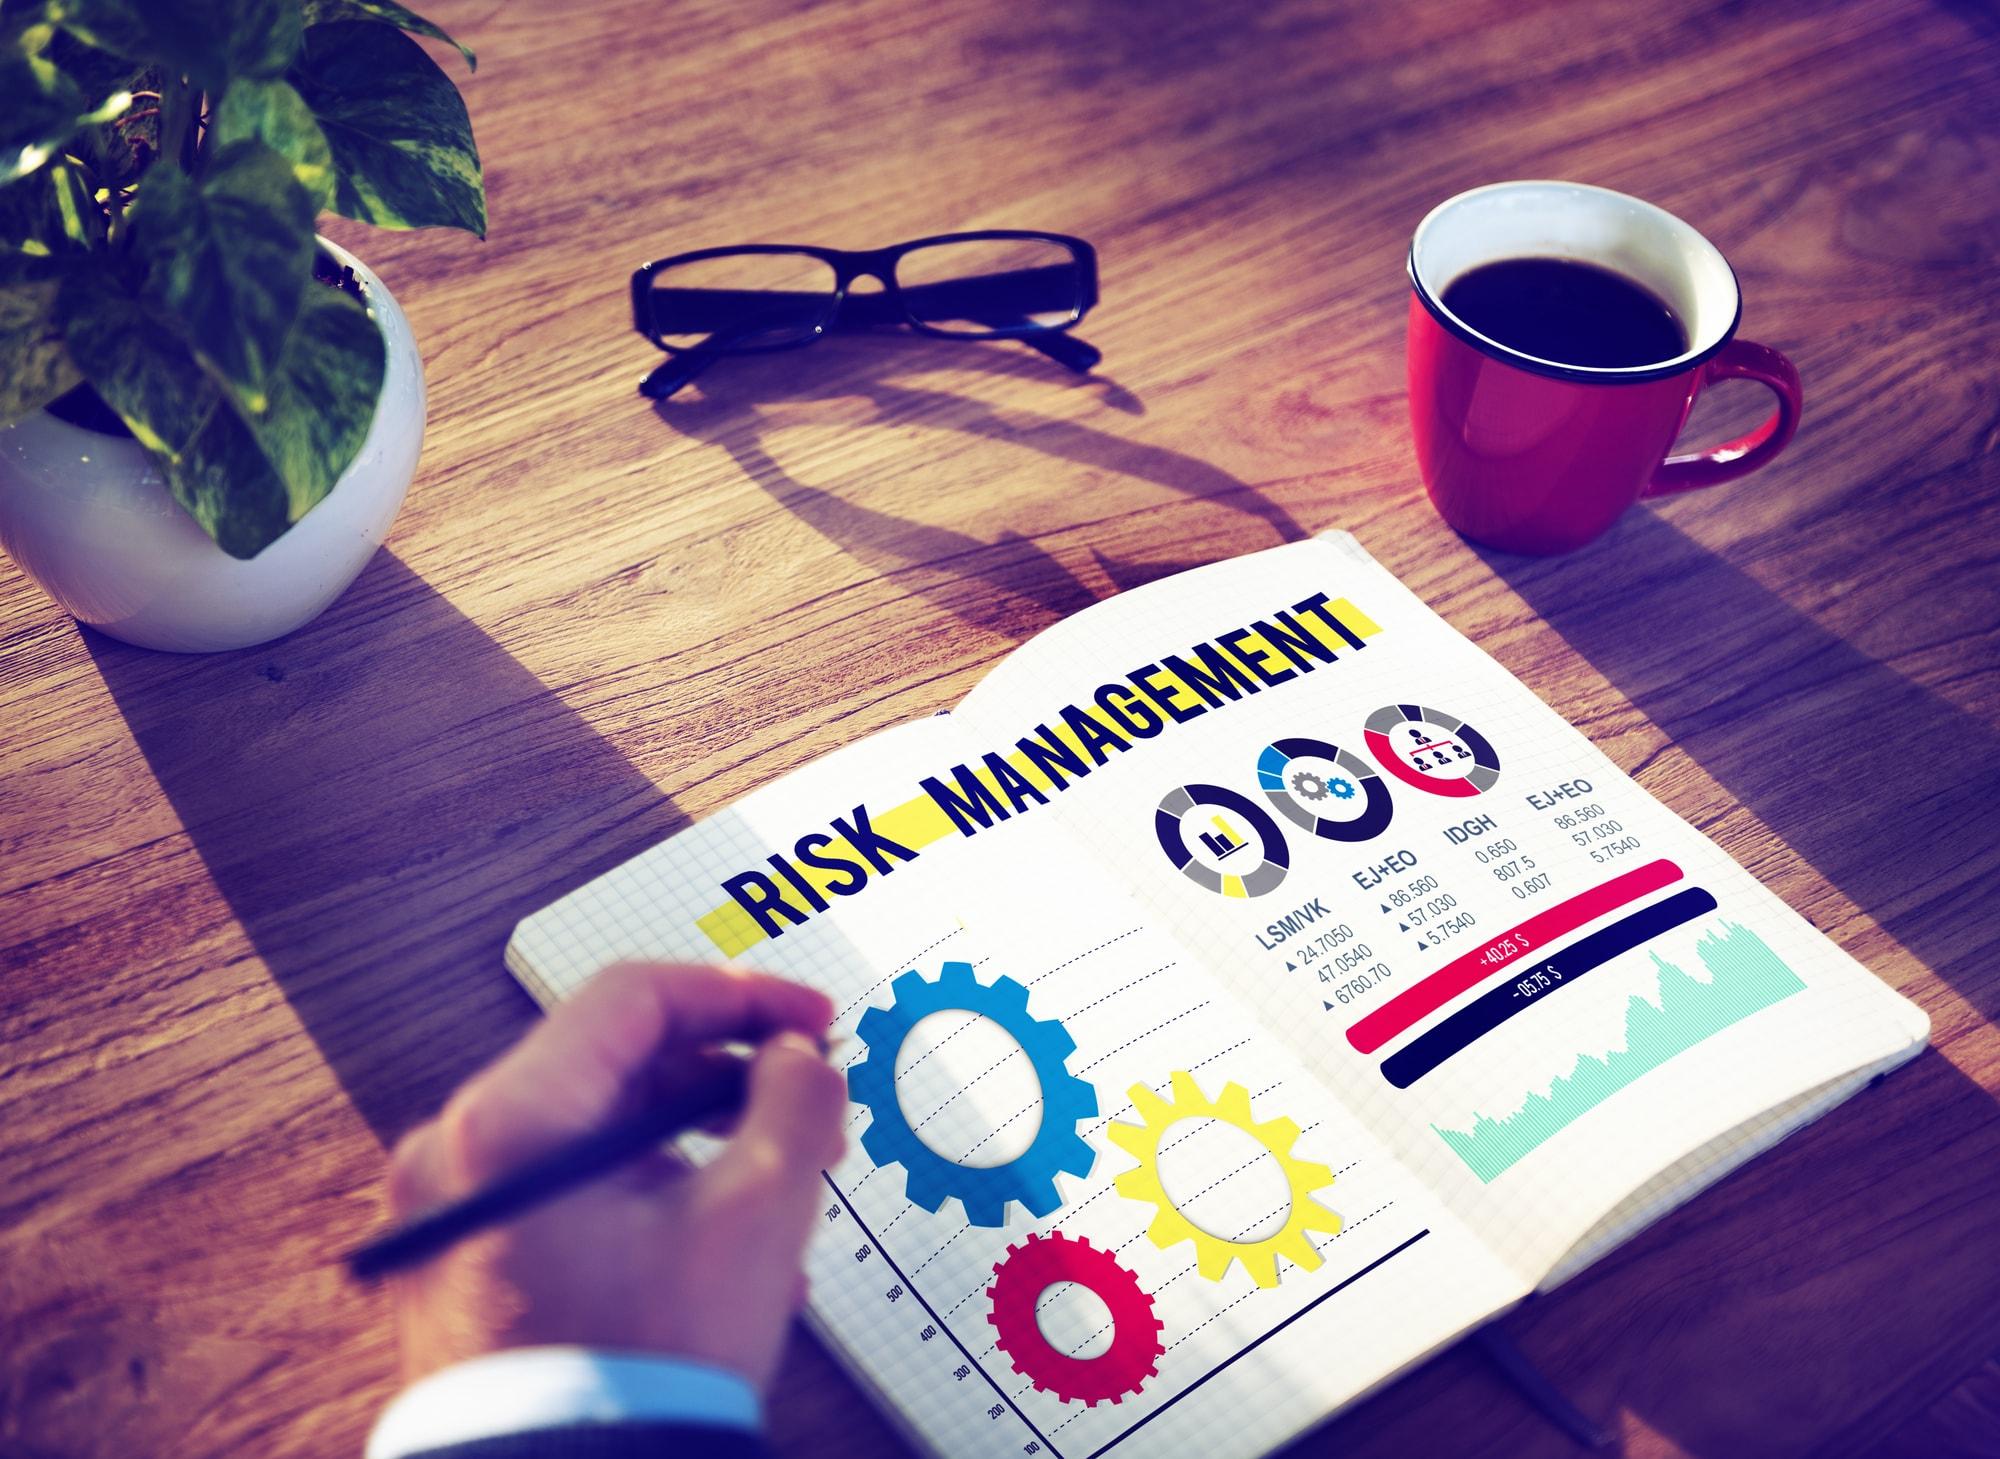 Risk management in software testing.